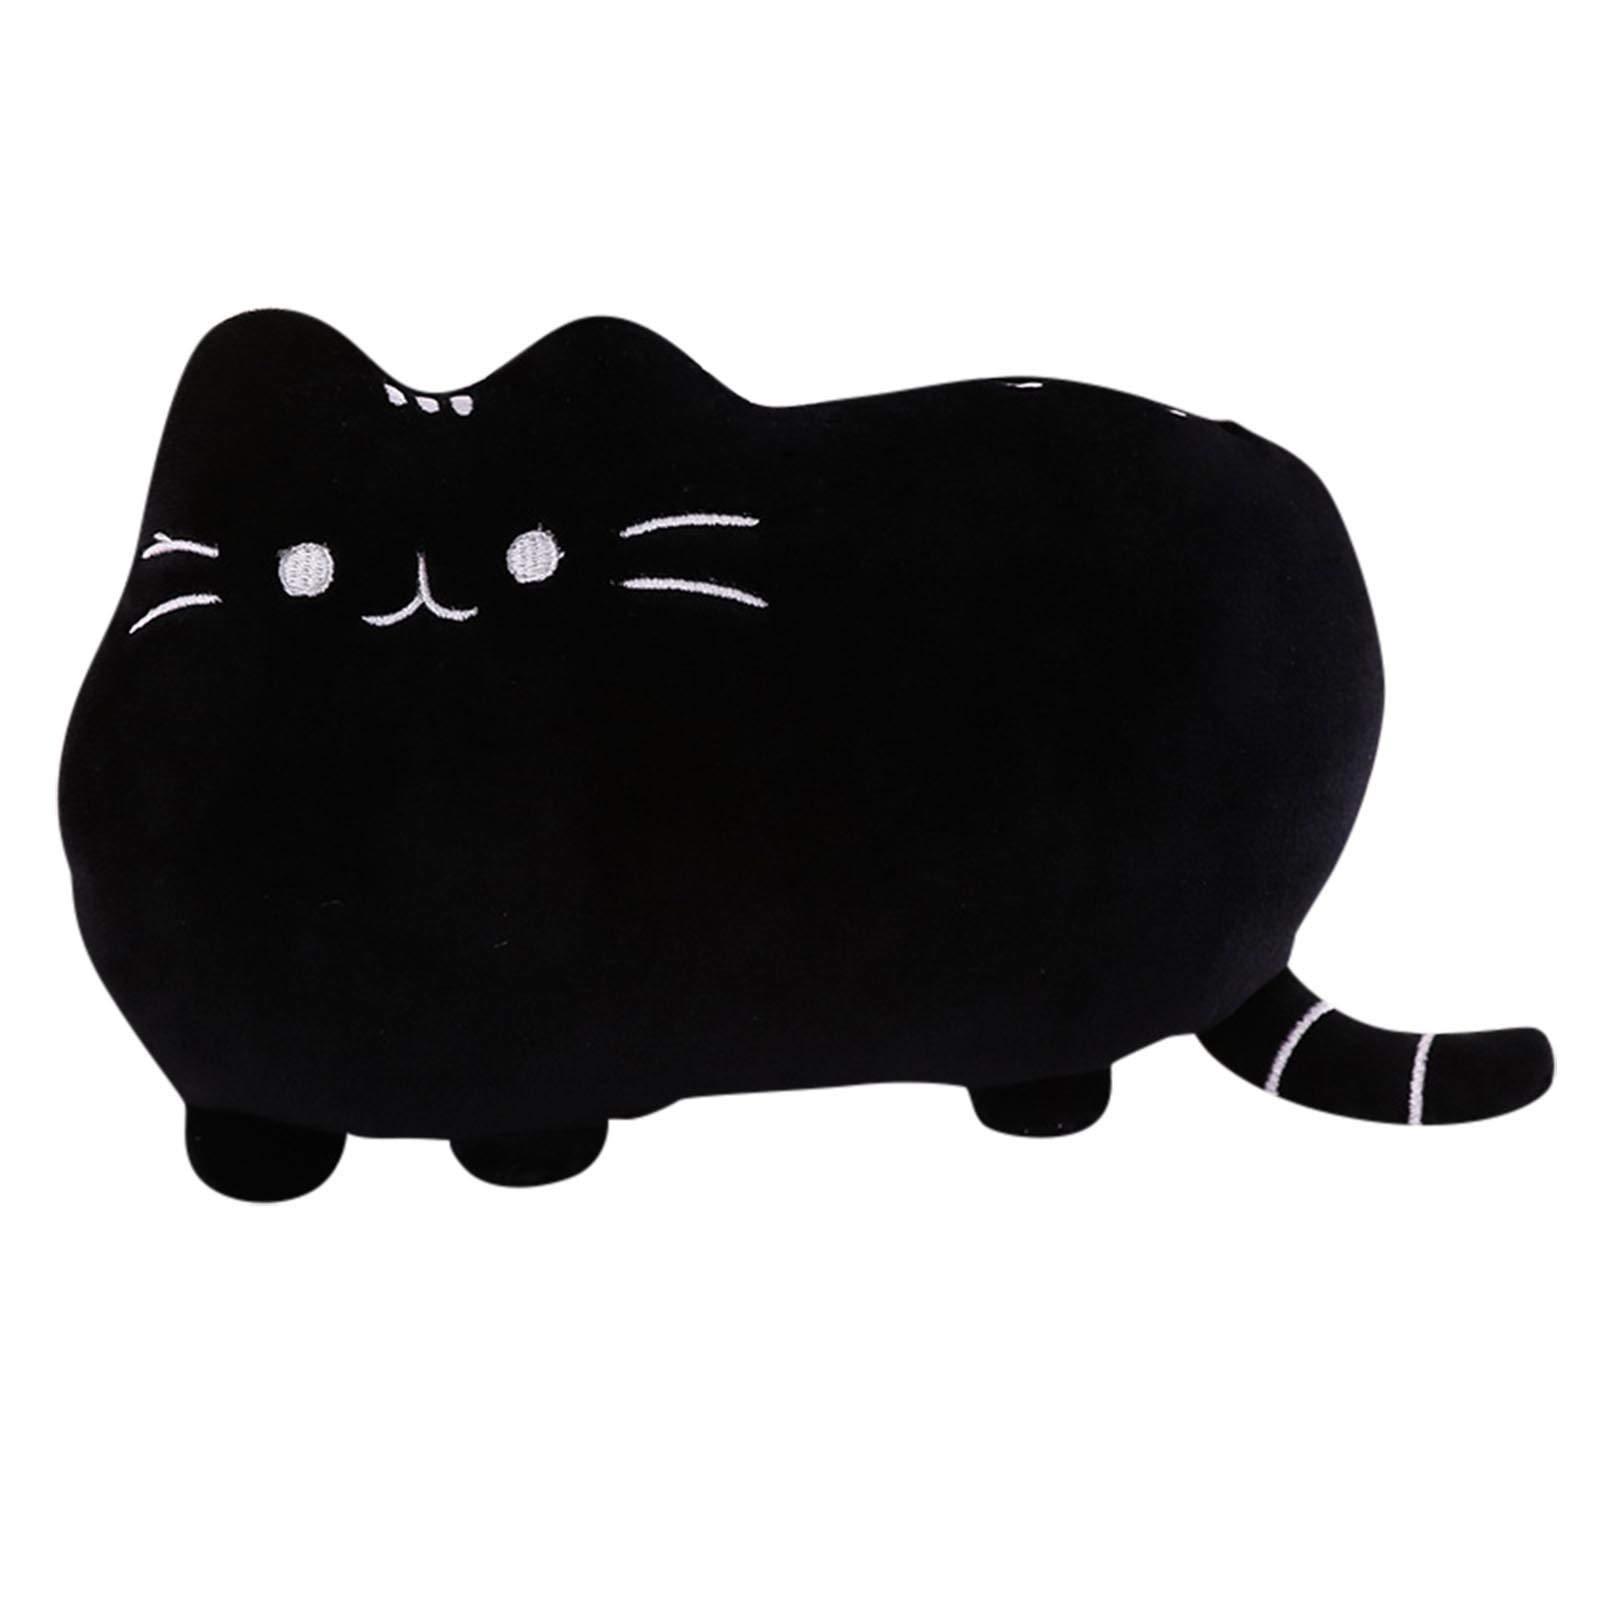 Sdeycui Cute Dinosaur Stuffed Animals Plush Toy Pillow Doll Soft Lumbar Back Cushion Gift for Kids (Black Cat, 6.69'')